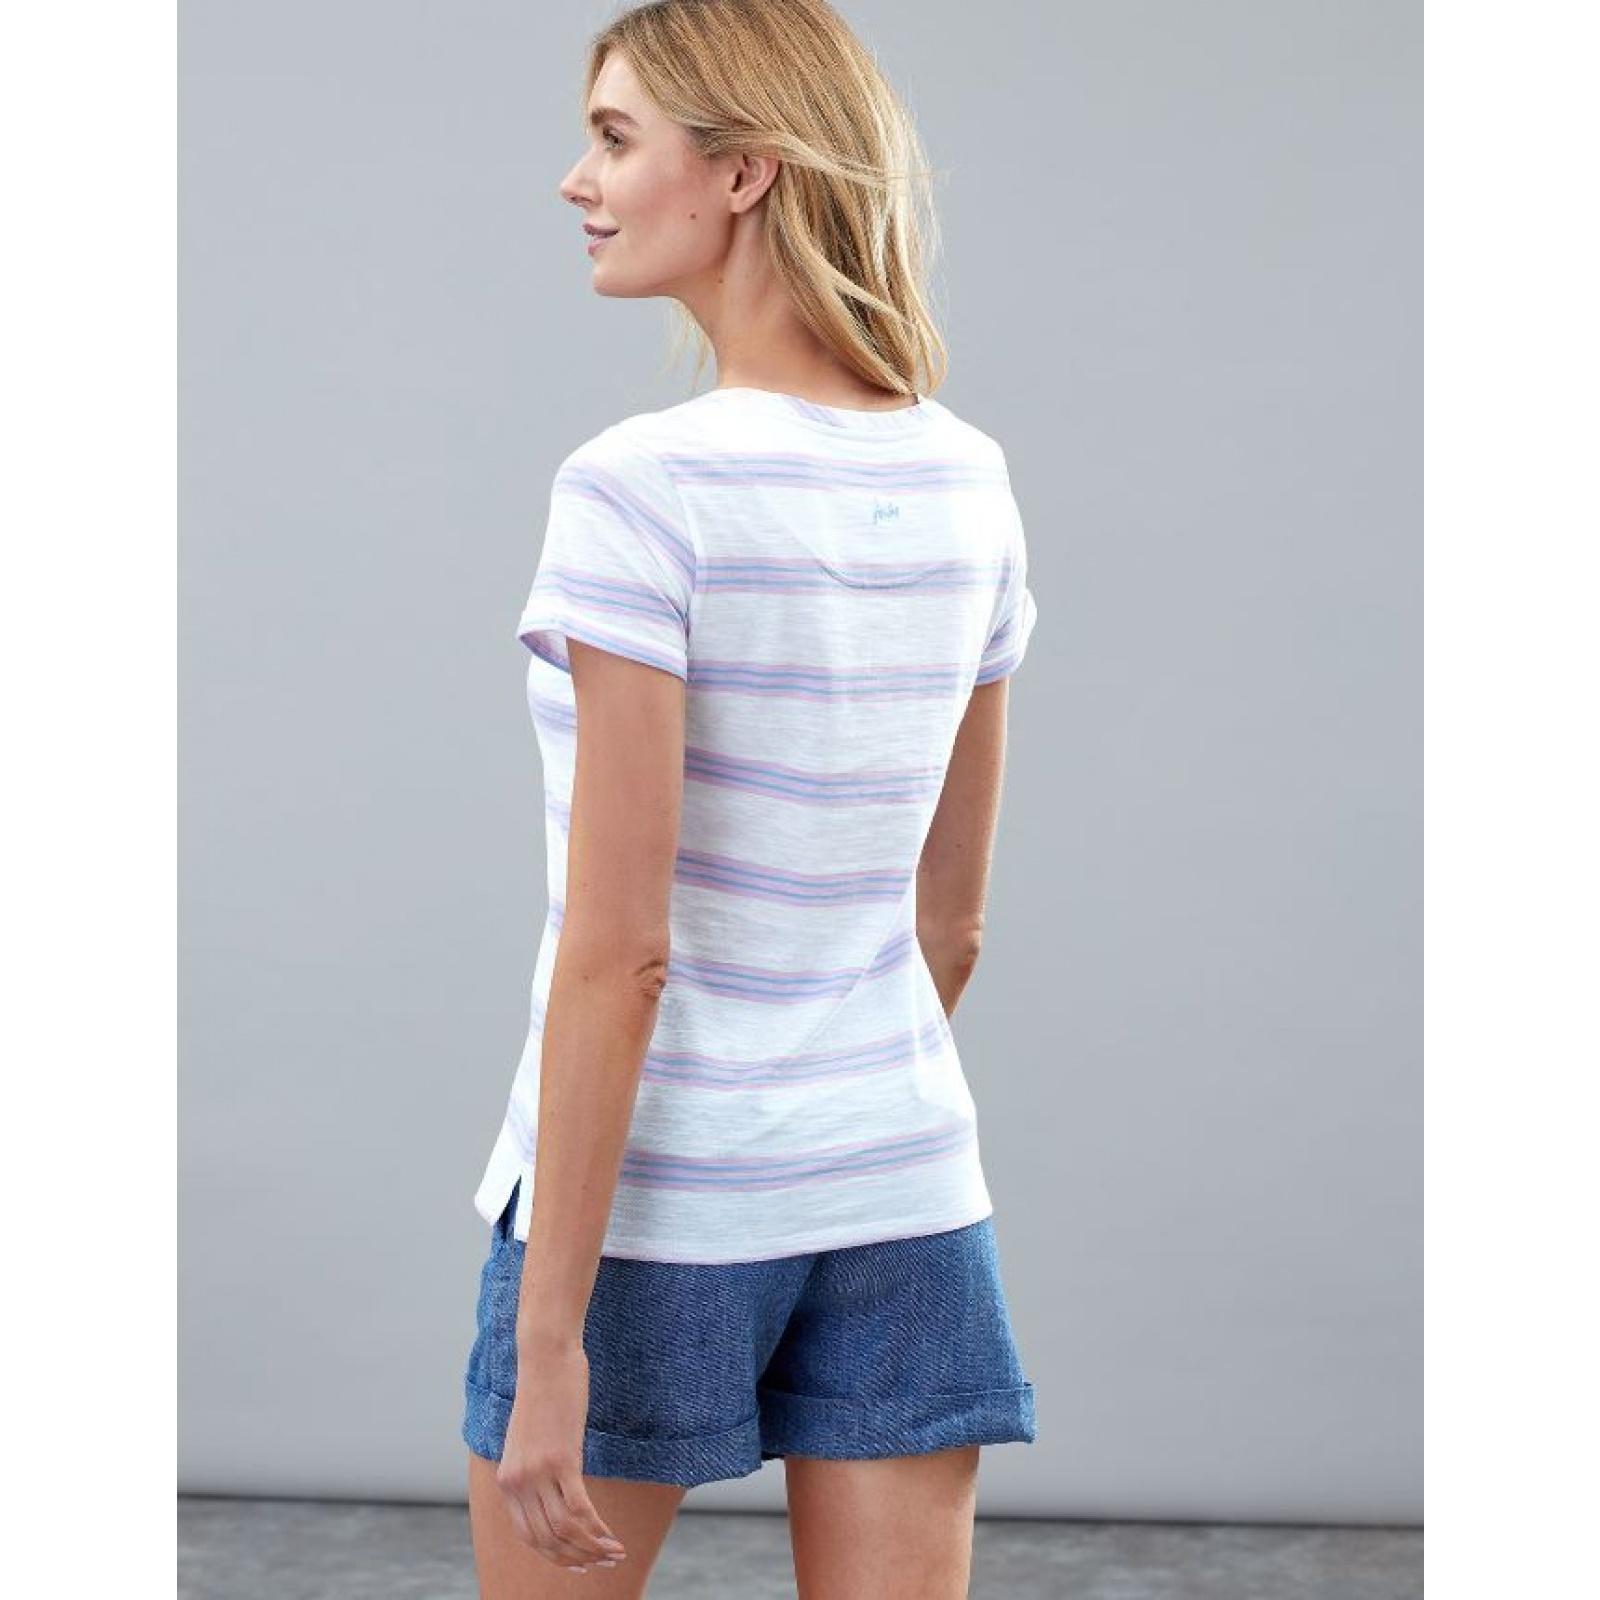 Joules-Nessa-Raya-Ligero-Jersey-Camiseta-SS19 miniatura 9